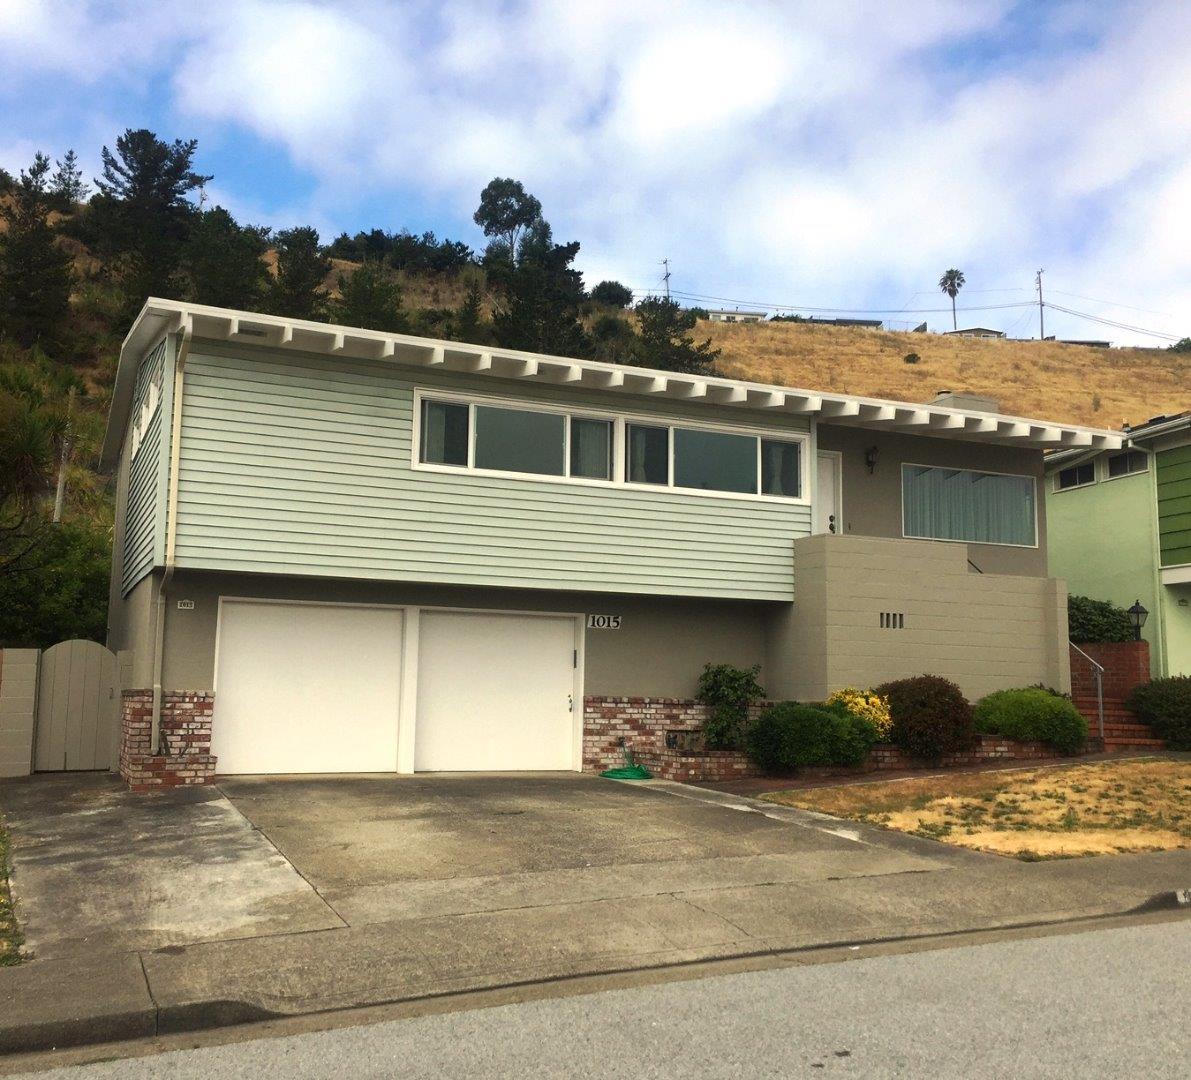 Casa Unifamiliar por un Alquiler en 1015 Pinehurst Court Millbrae, California 94030 Estados Unidos